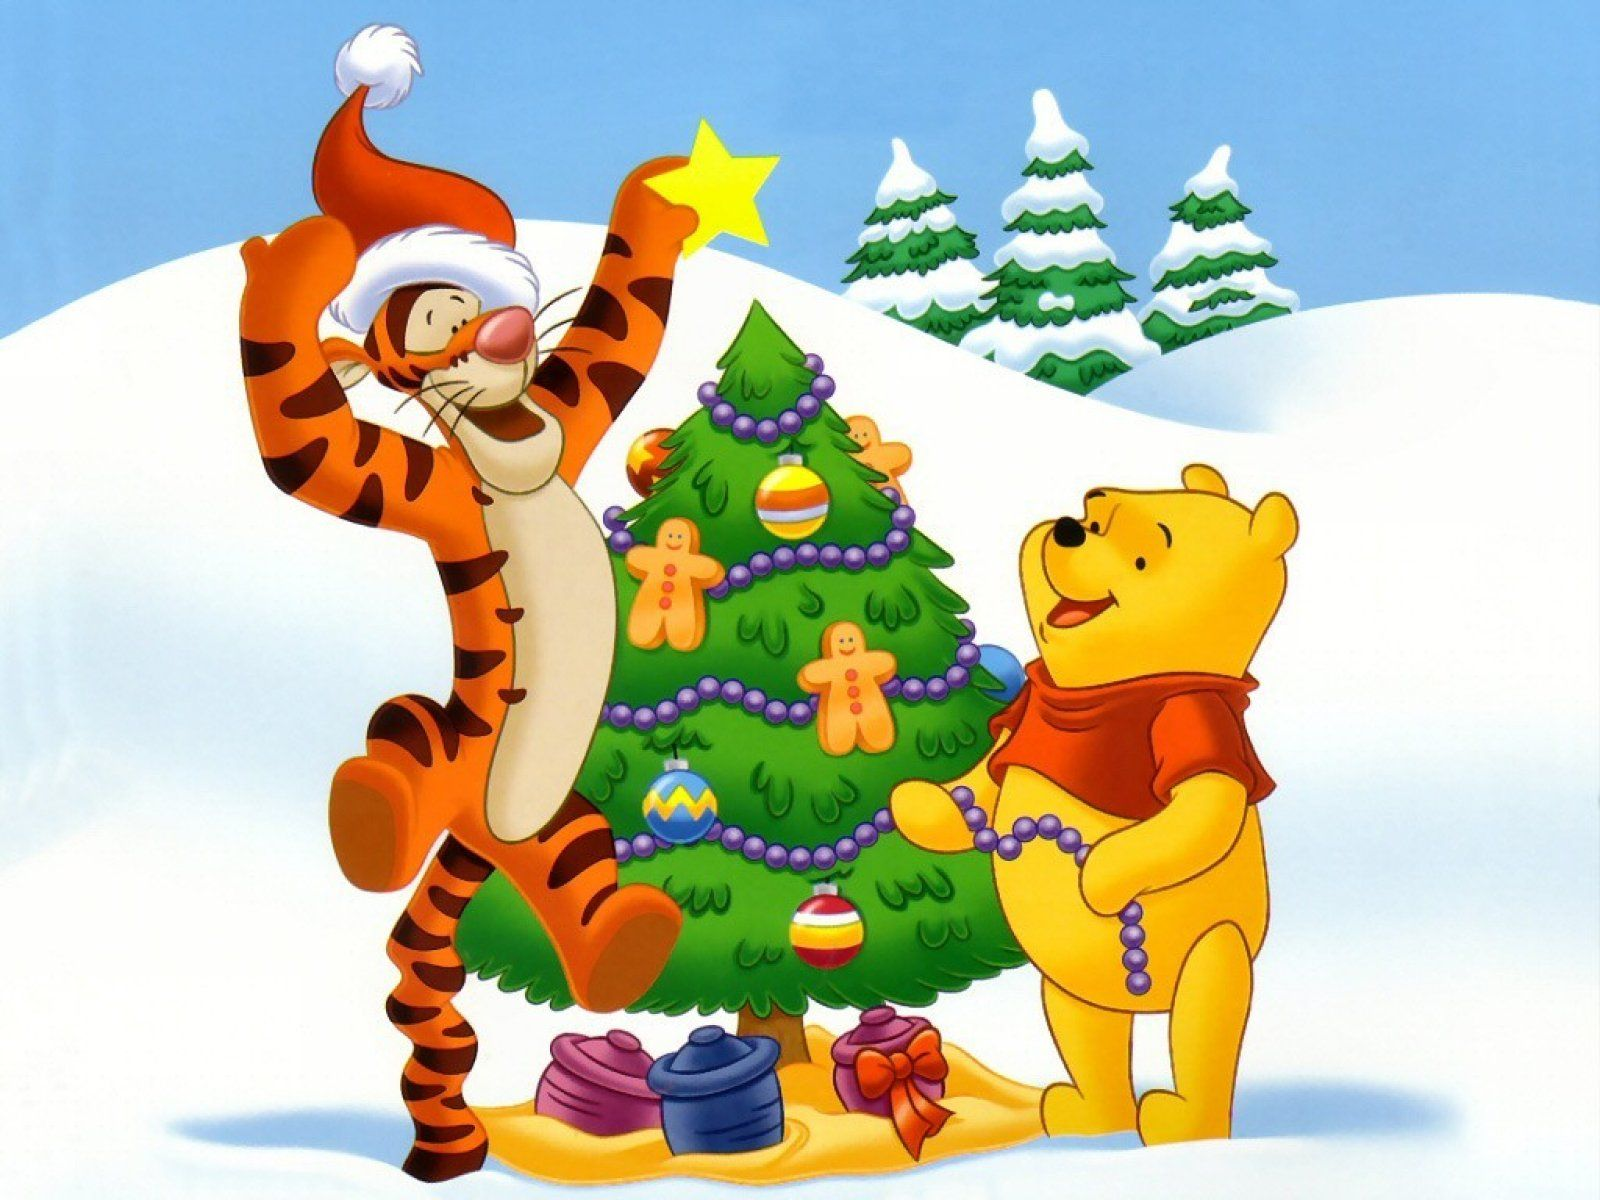 Christmas Tree For Winnie The Pooh Winnie The Pooh Christmas Christmas Cartoon Pictures Animated Christmas